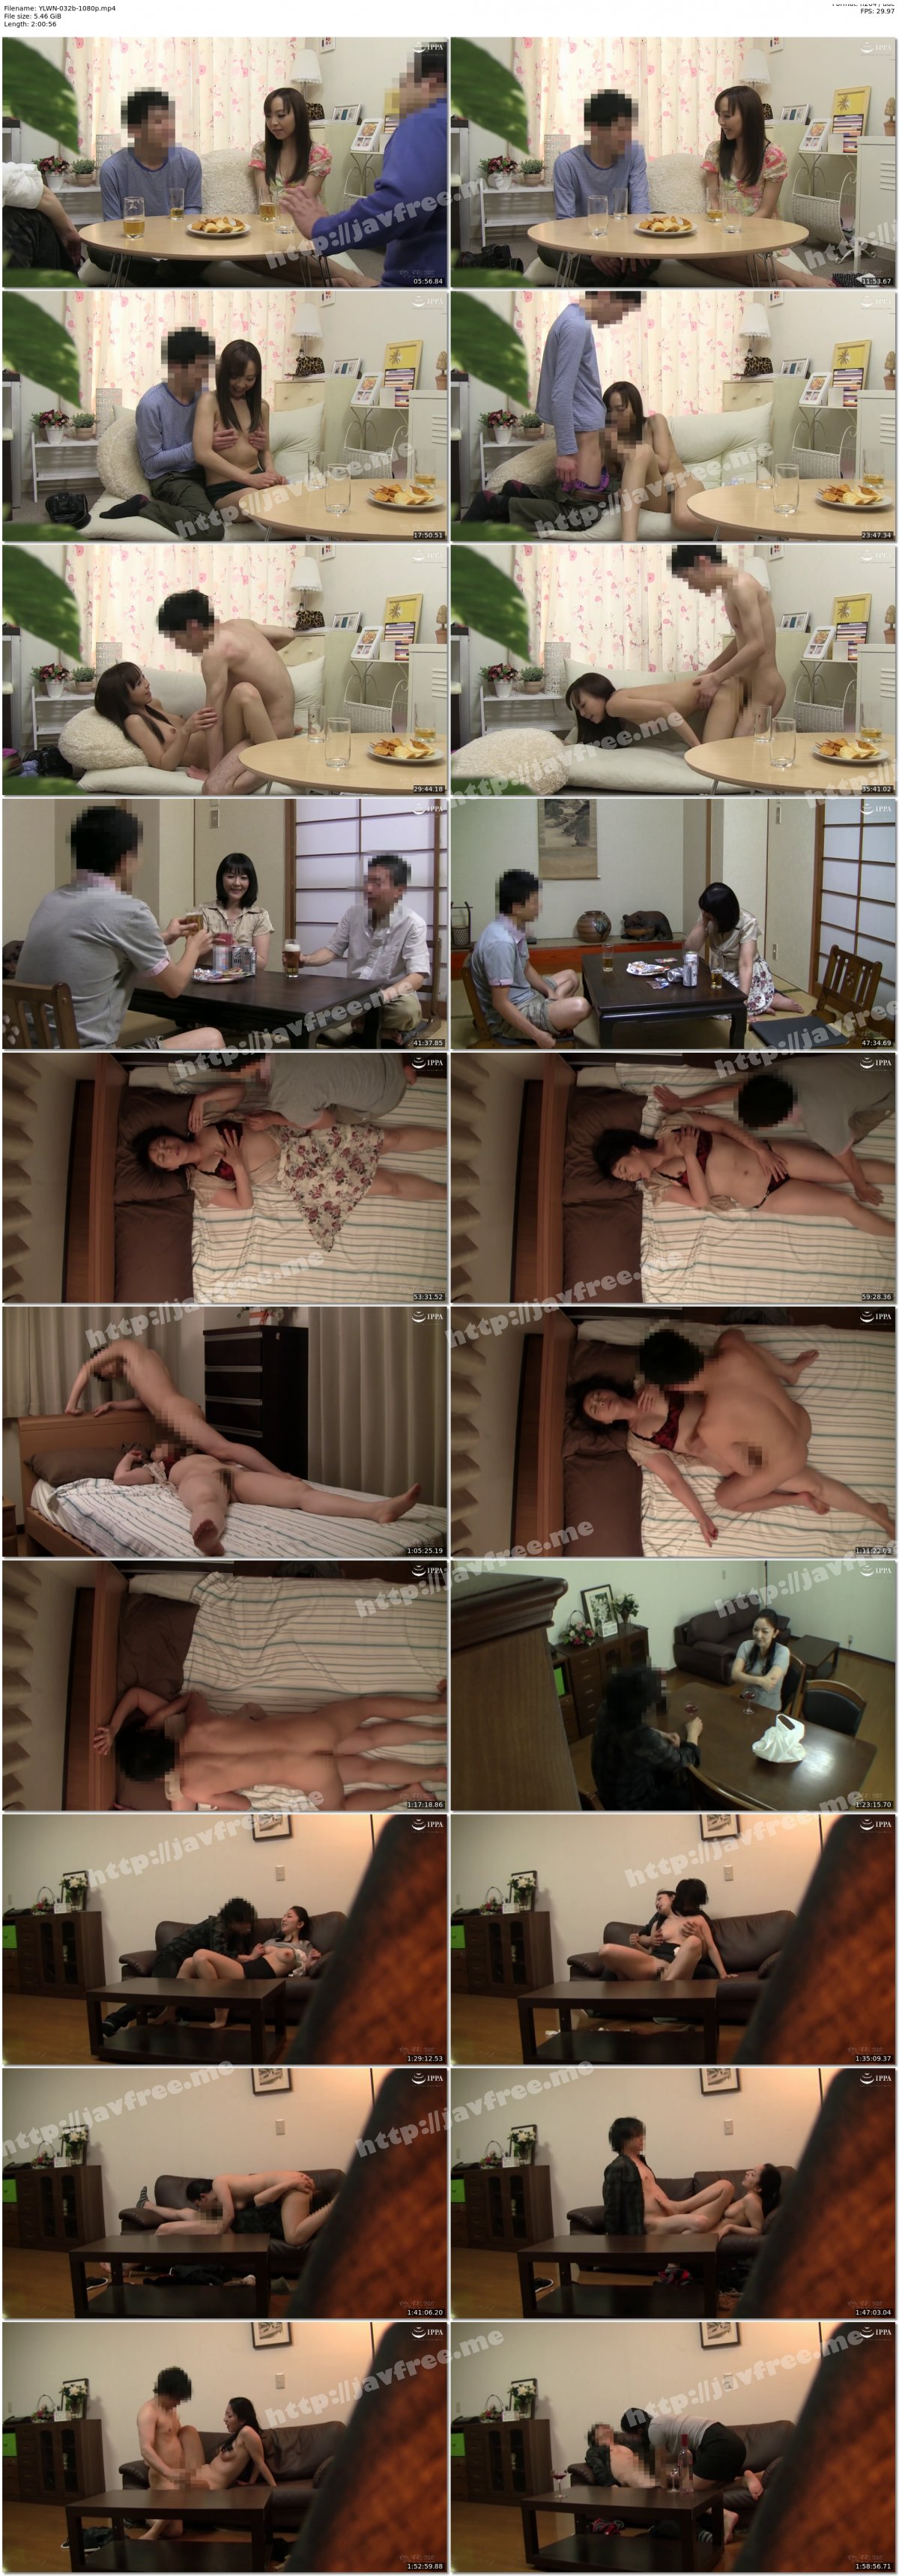 [HD][YLWN-032] 自慢の美人妻を酔わせて知り合いの他人棒で寝取らせてみた4時間 - image YLWN-032b-1080p on https://javfree.me